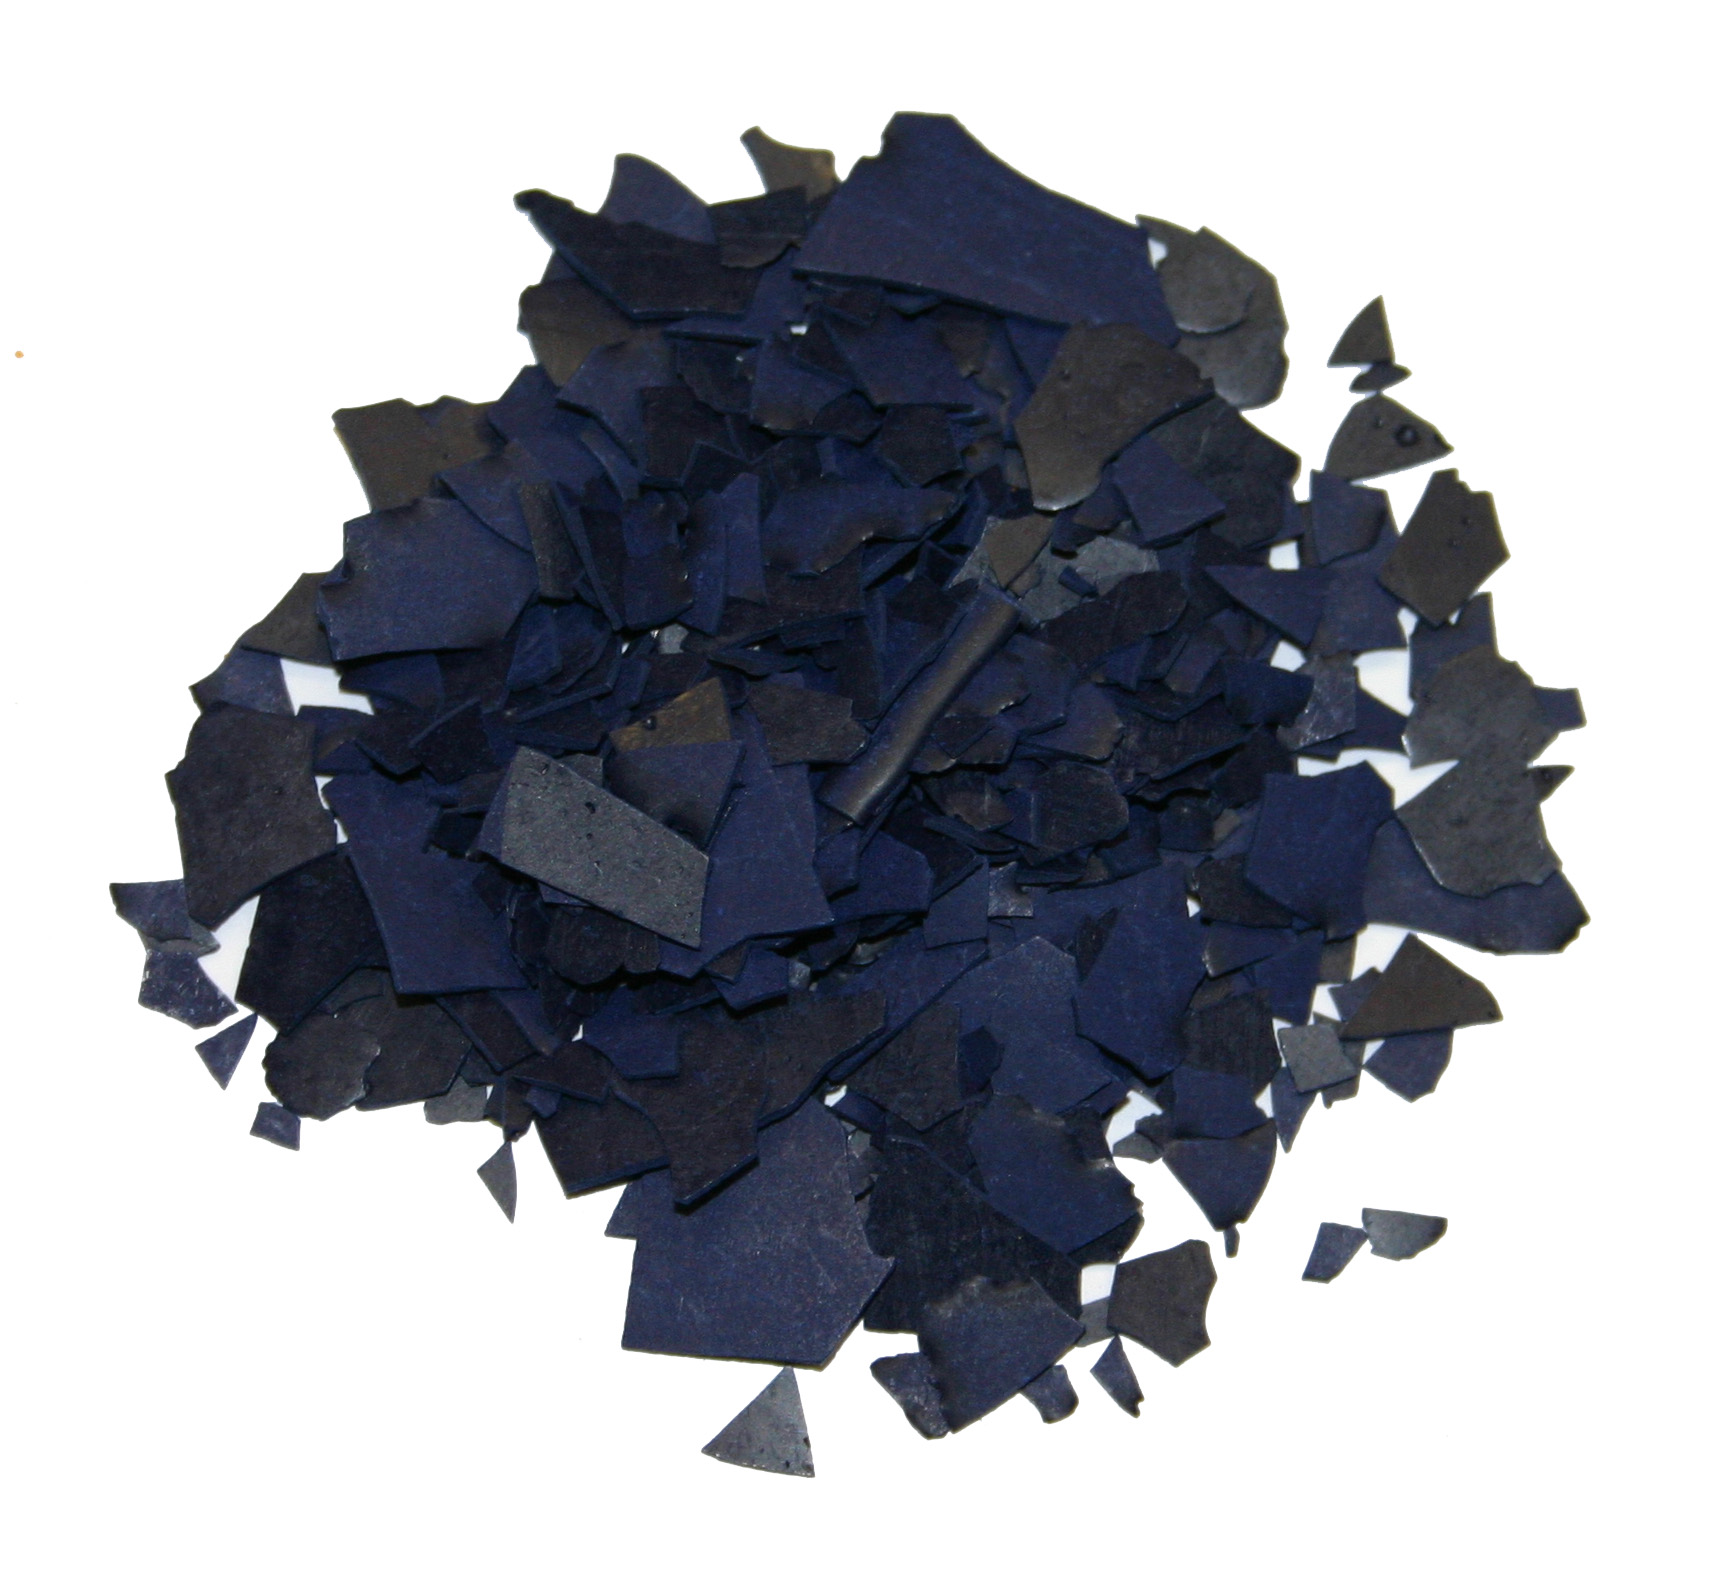 wachsfarben kerzenfarbe g nstig kaufen. Black Bedroom Furniture Sets. Home Design Ideas